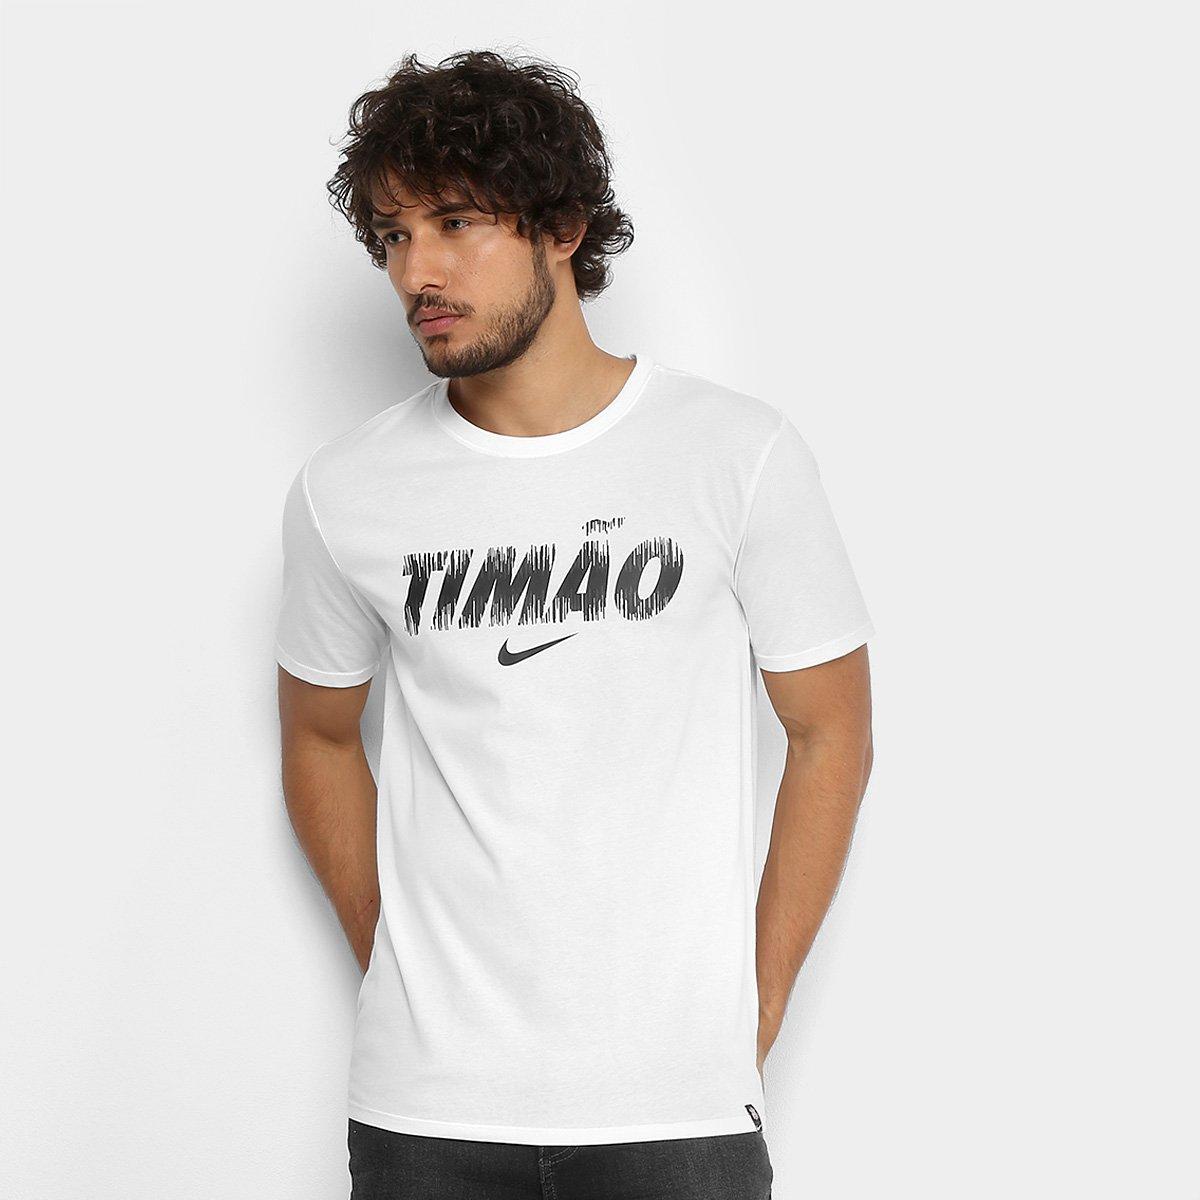 Camiseta Corinthians Nike Dry Masculina - Branco - Compre Agora ... 82091d85fec84